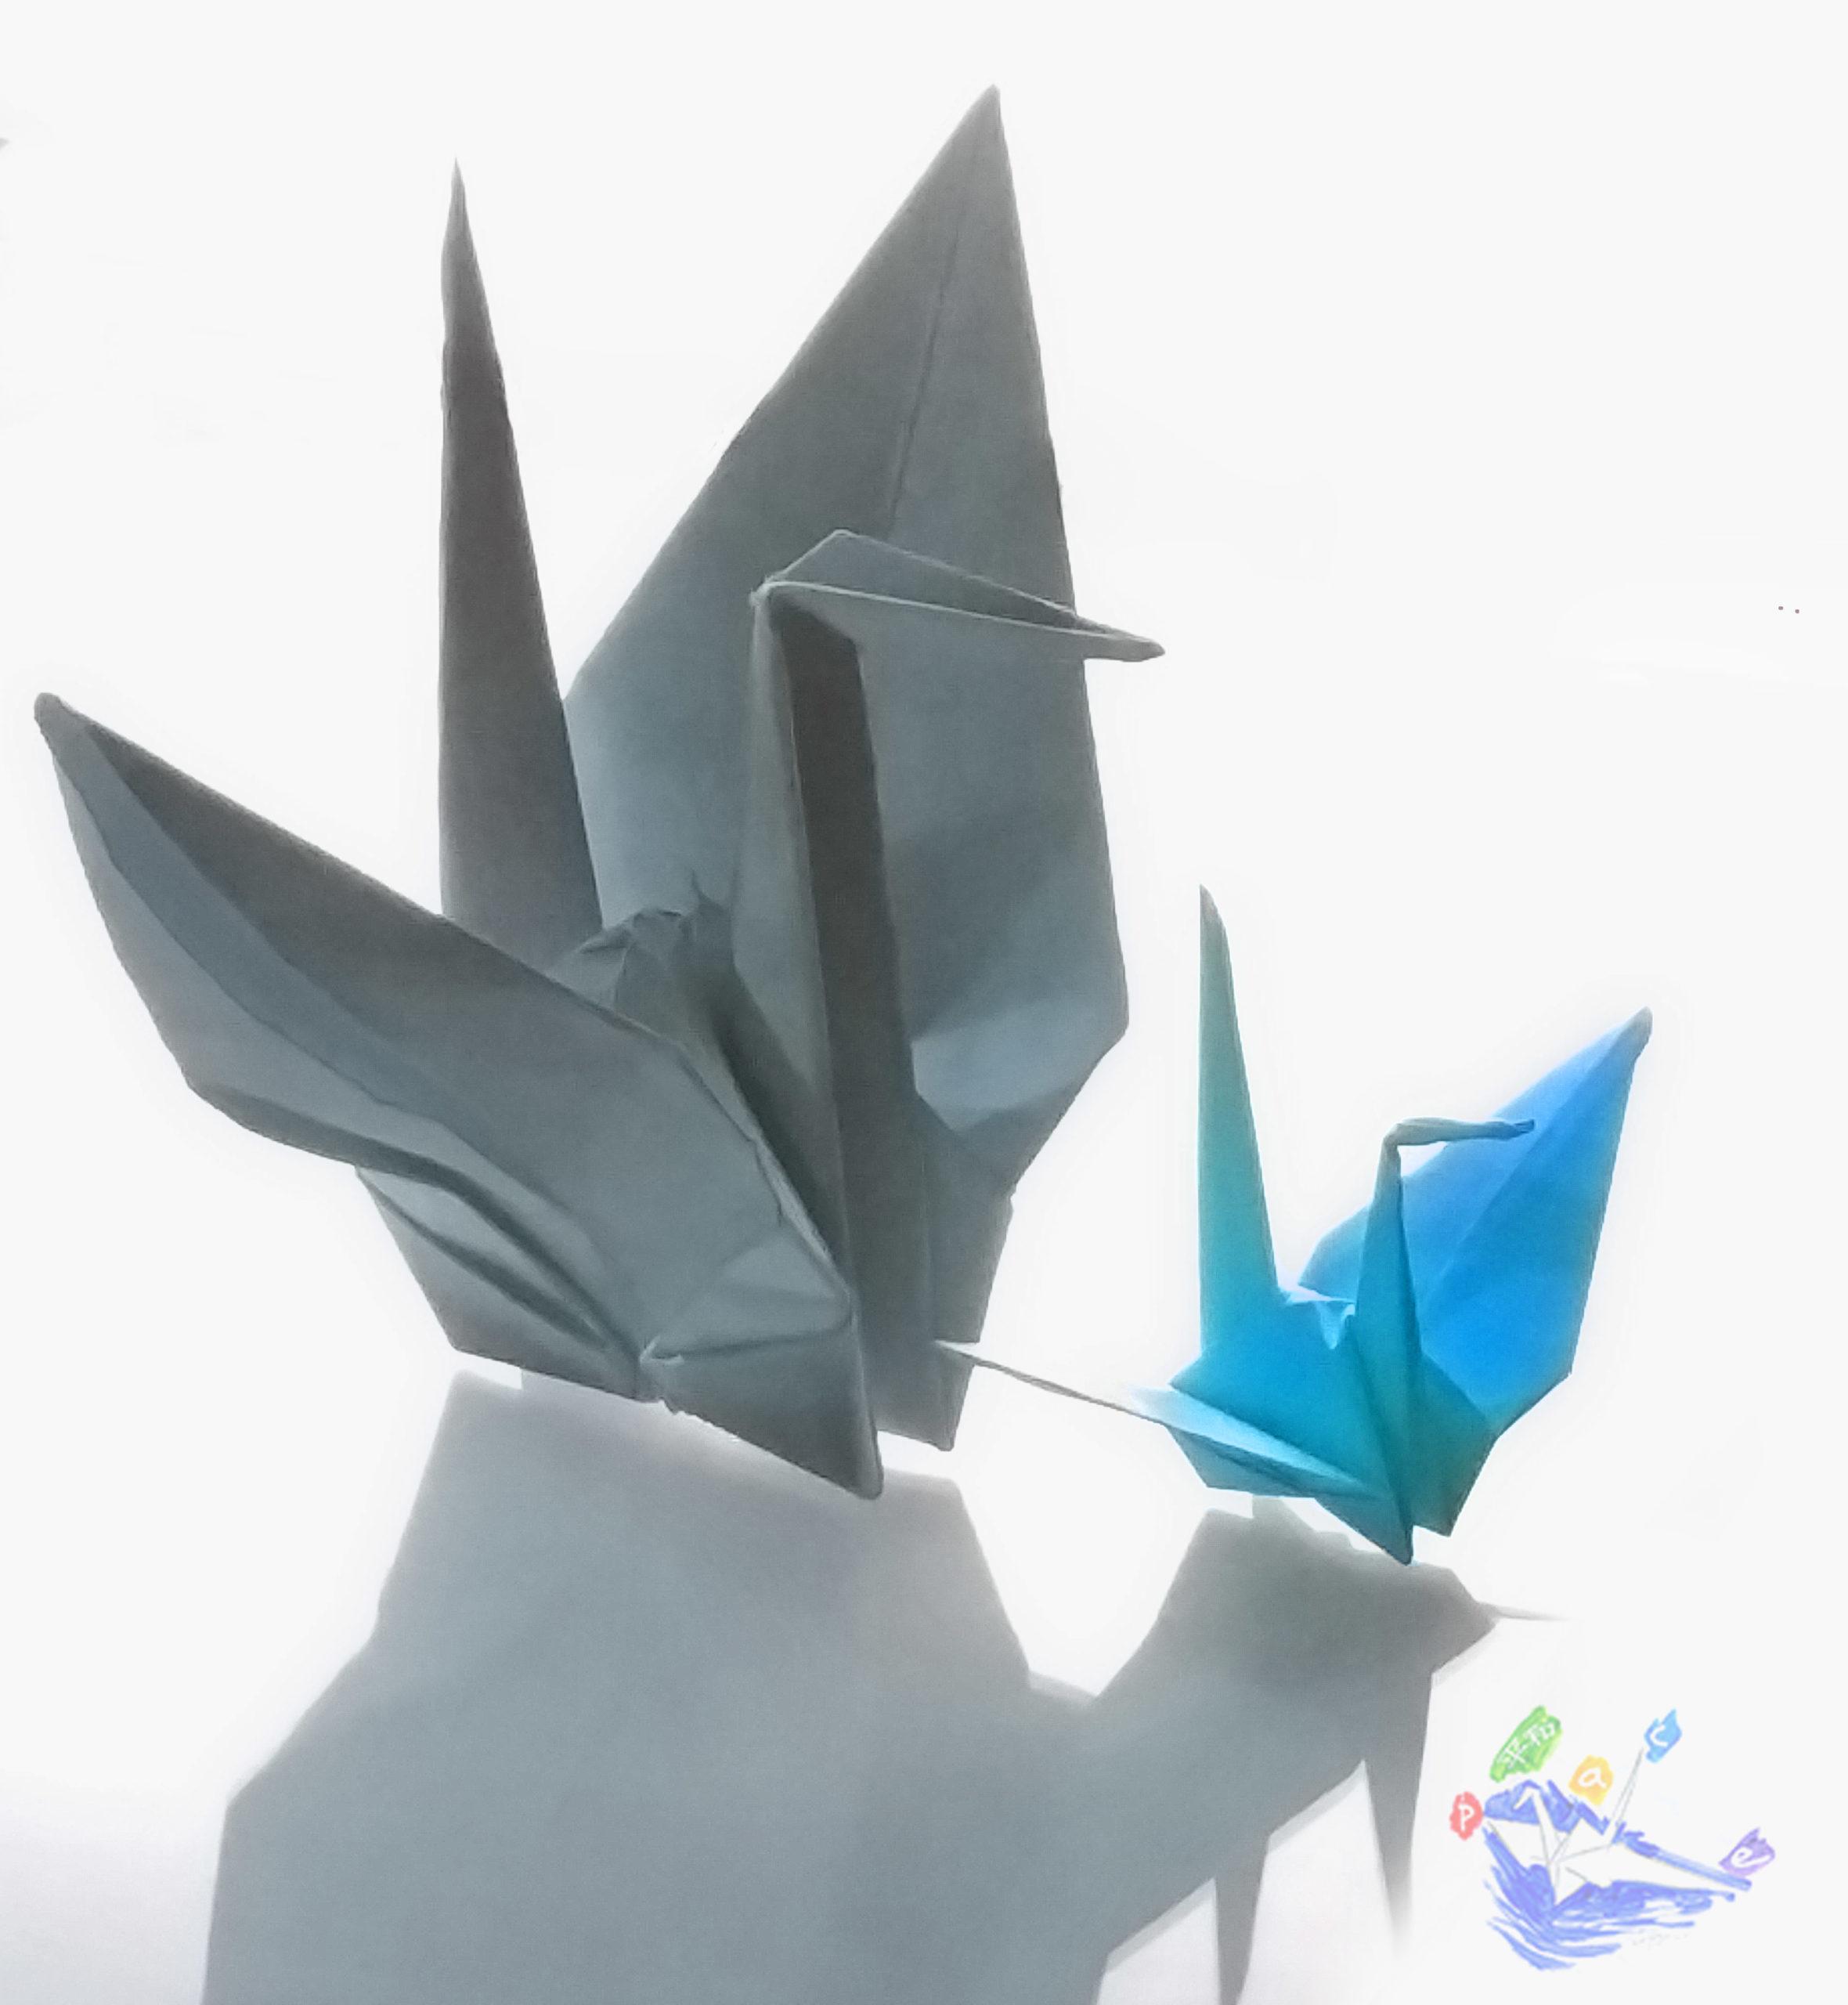 grudellapace azzurra